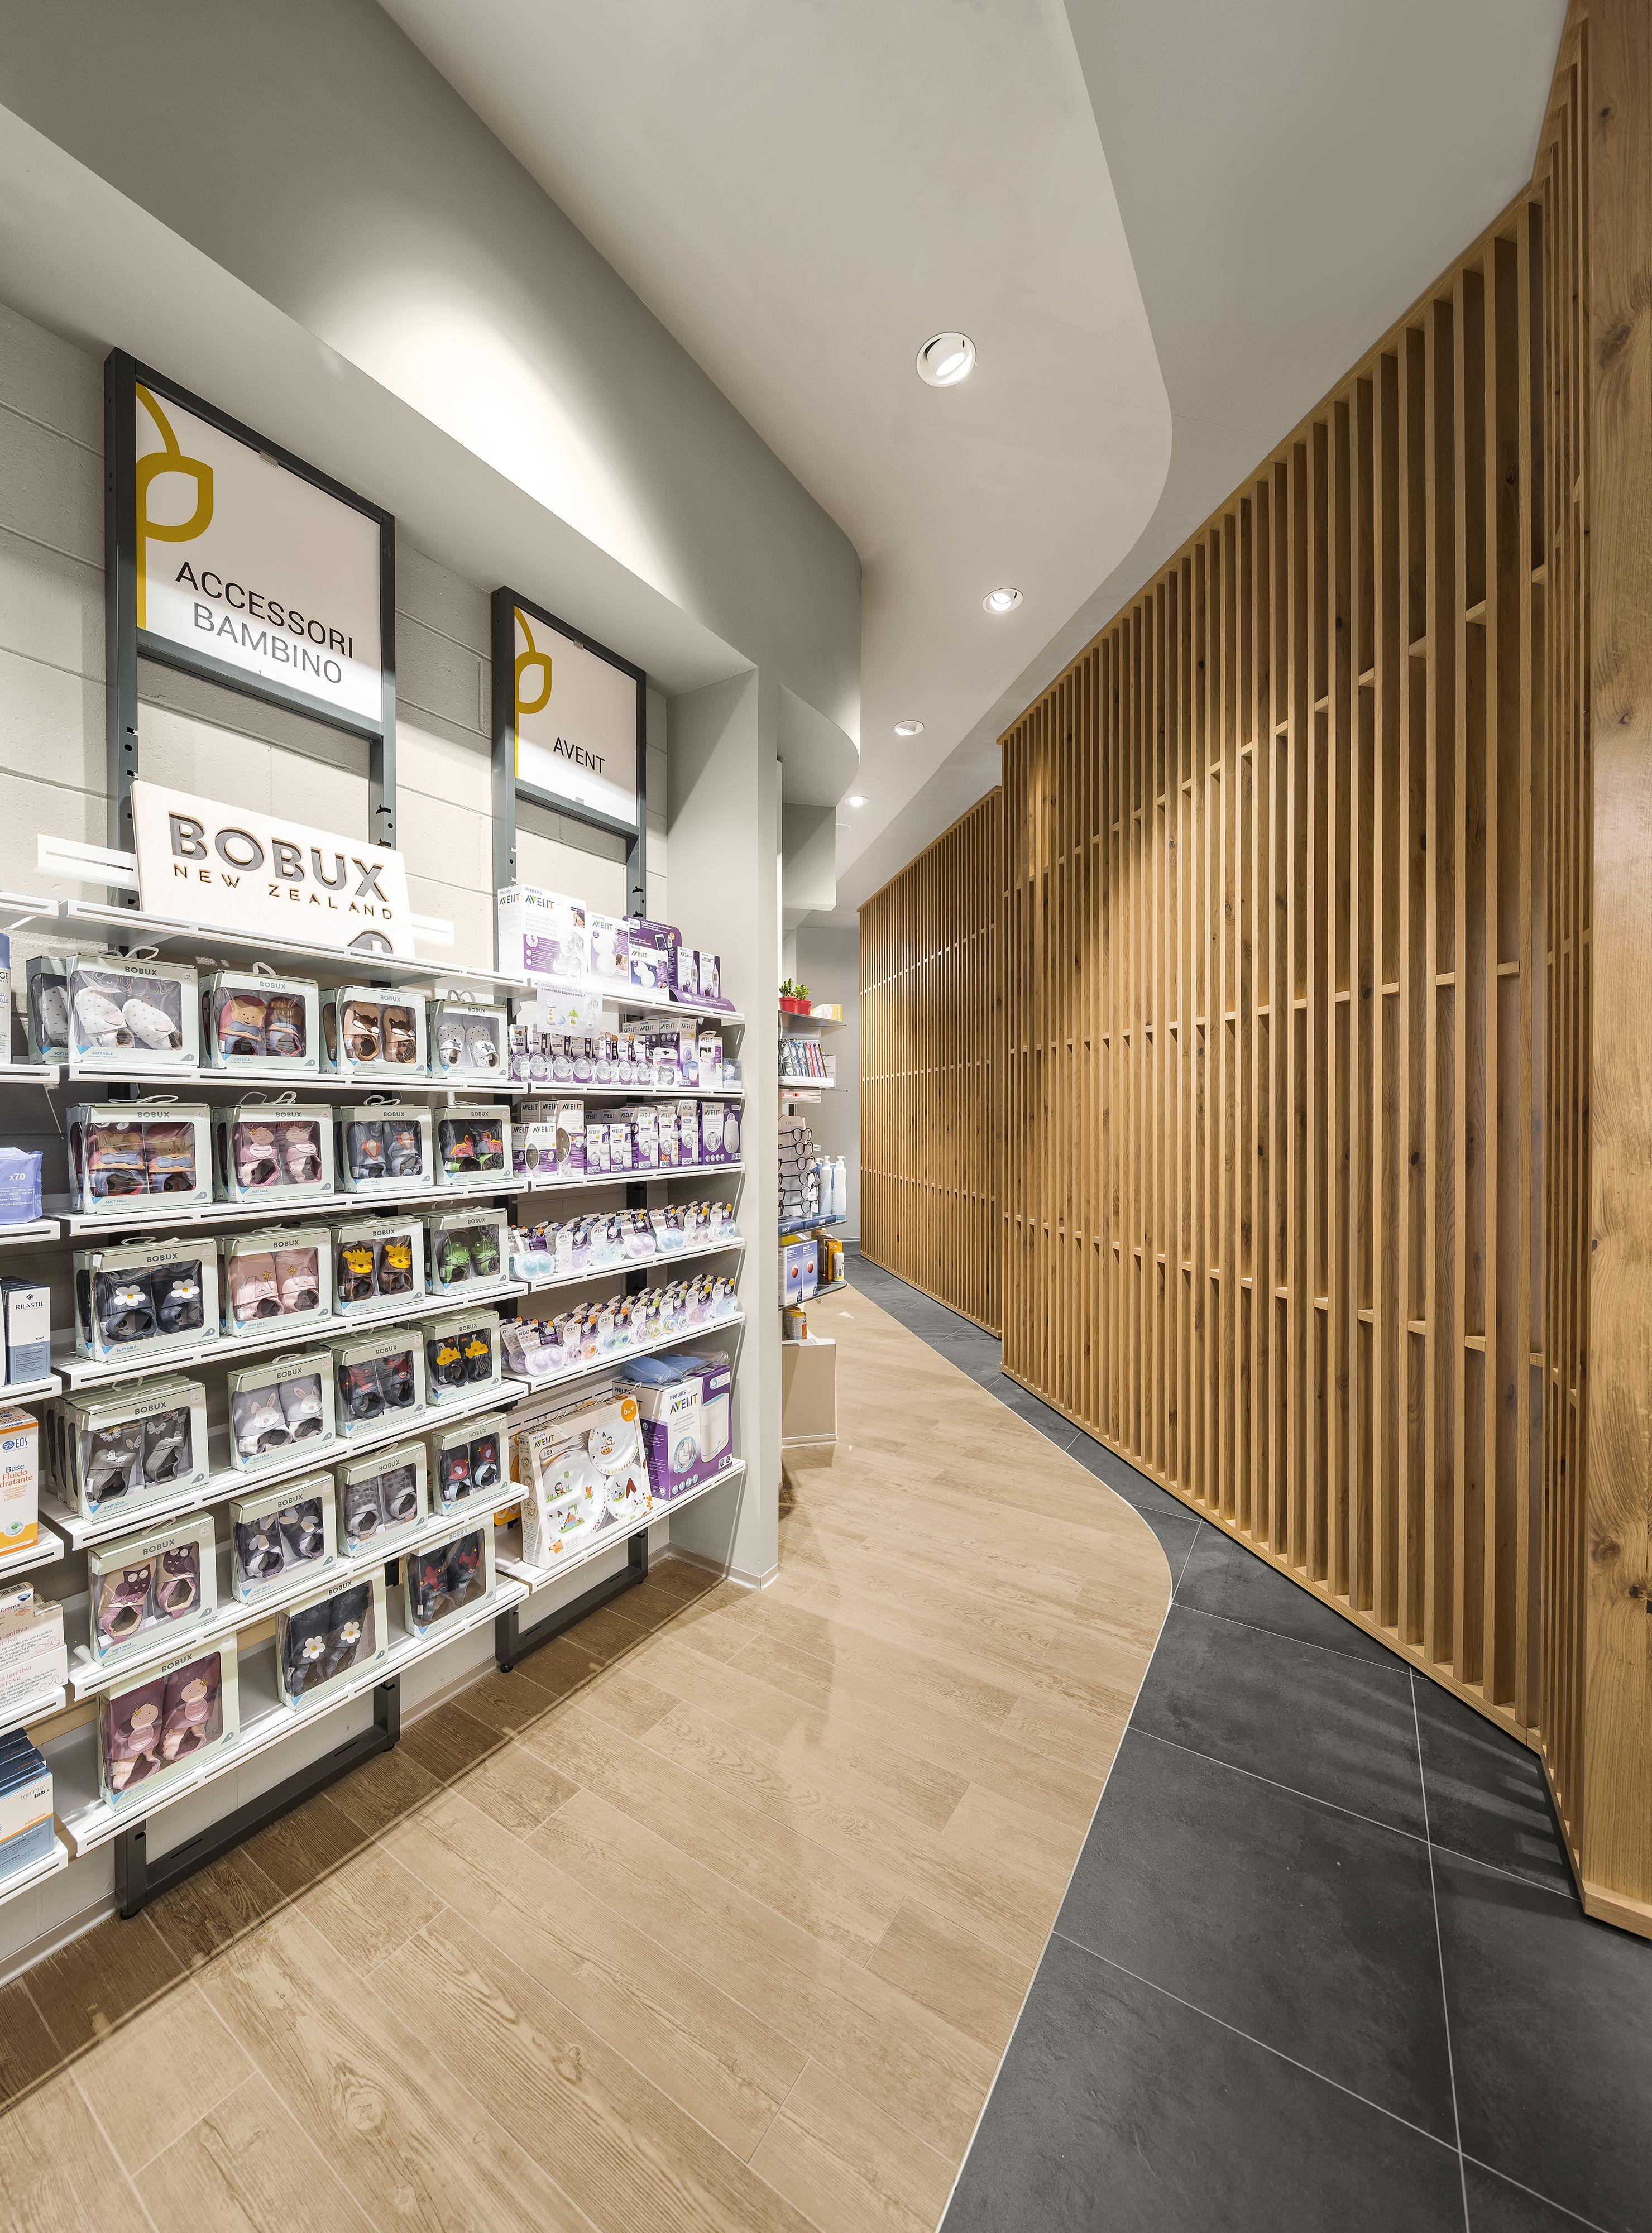 farmacia riva by amlab pharmacy design retail design store design pharmacy shelving - Pharmacy Design Ideas